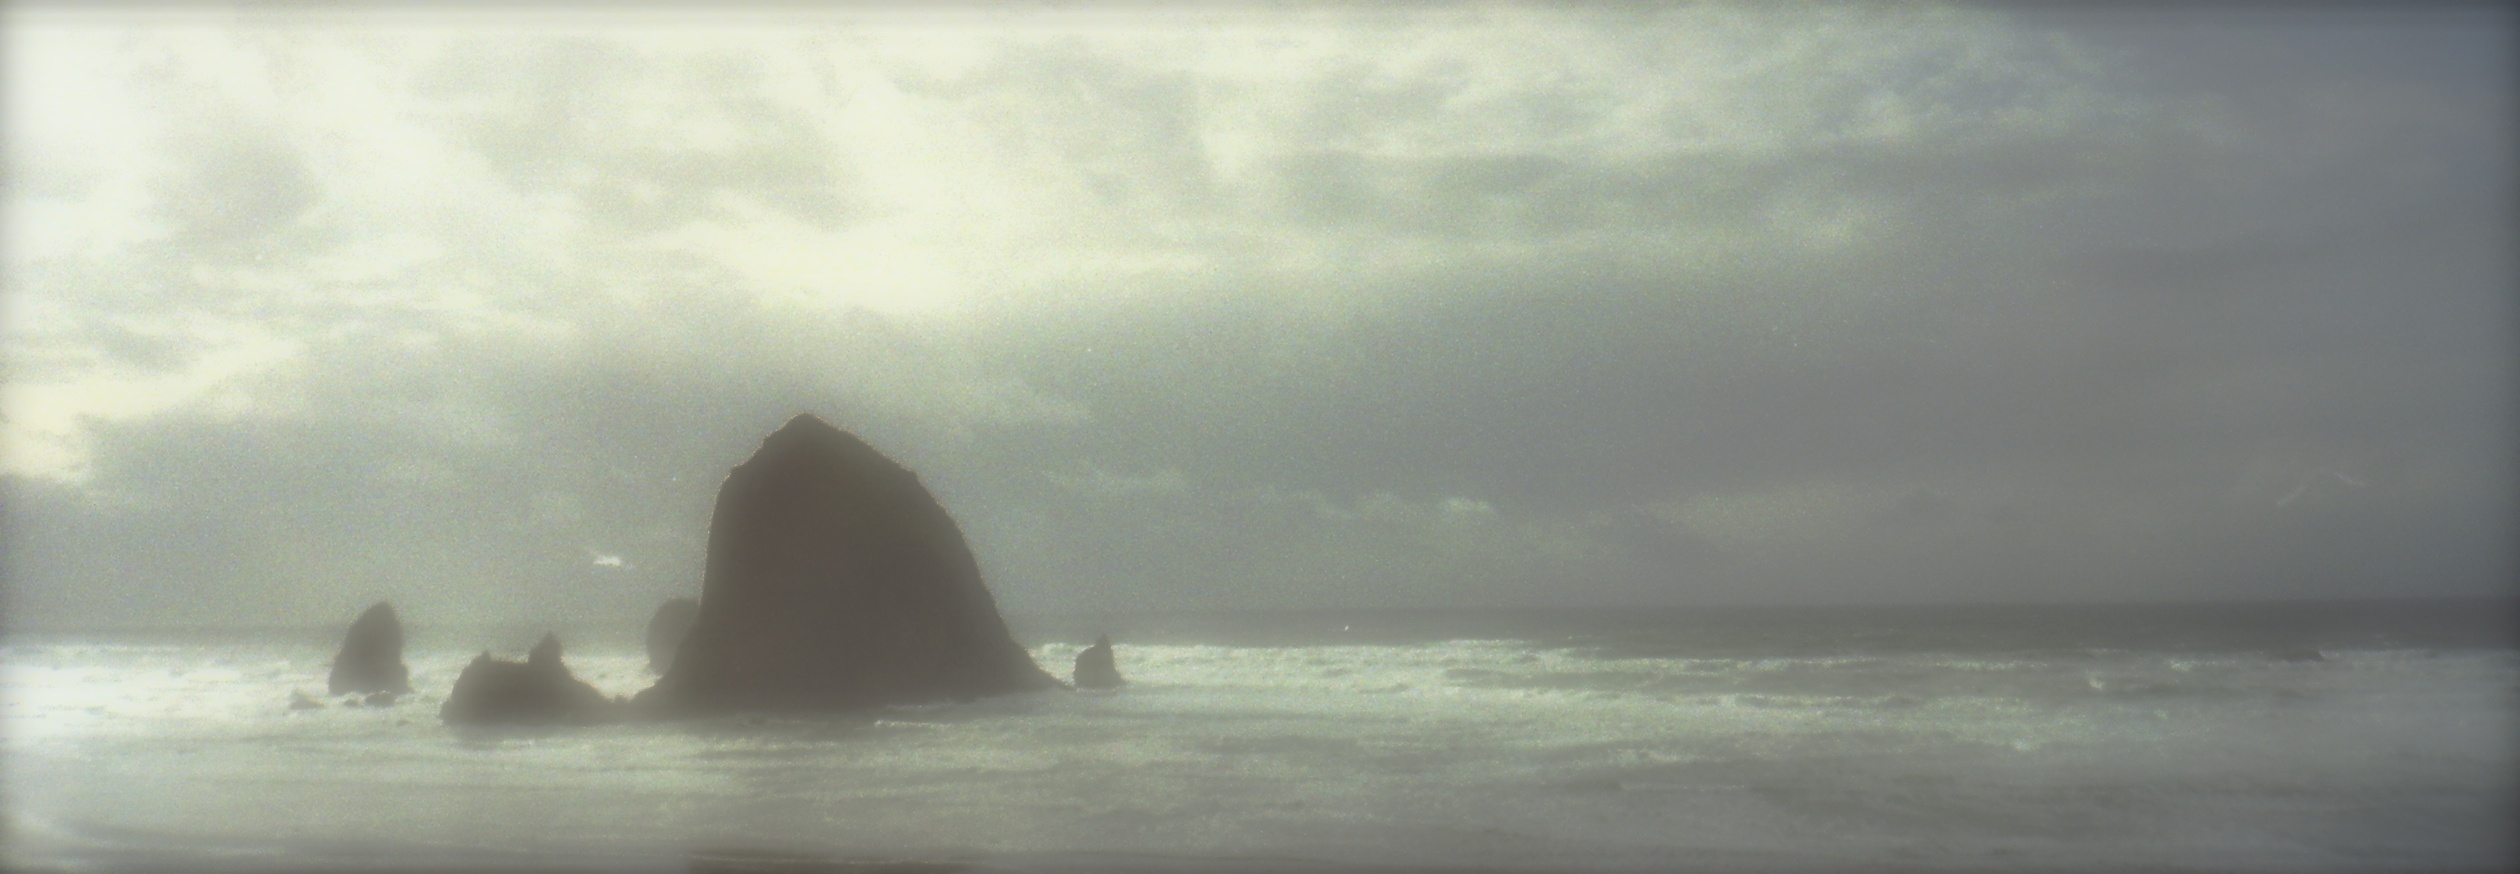 Cannon Beach 1992, room 342 b - Version 2